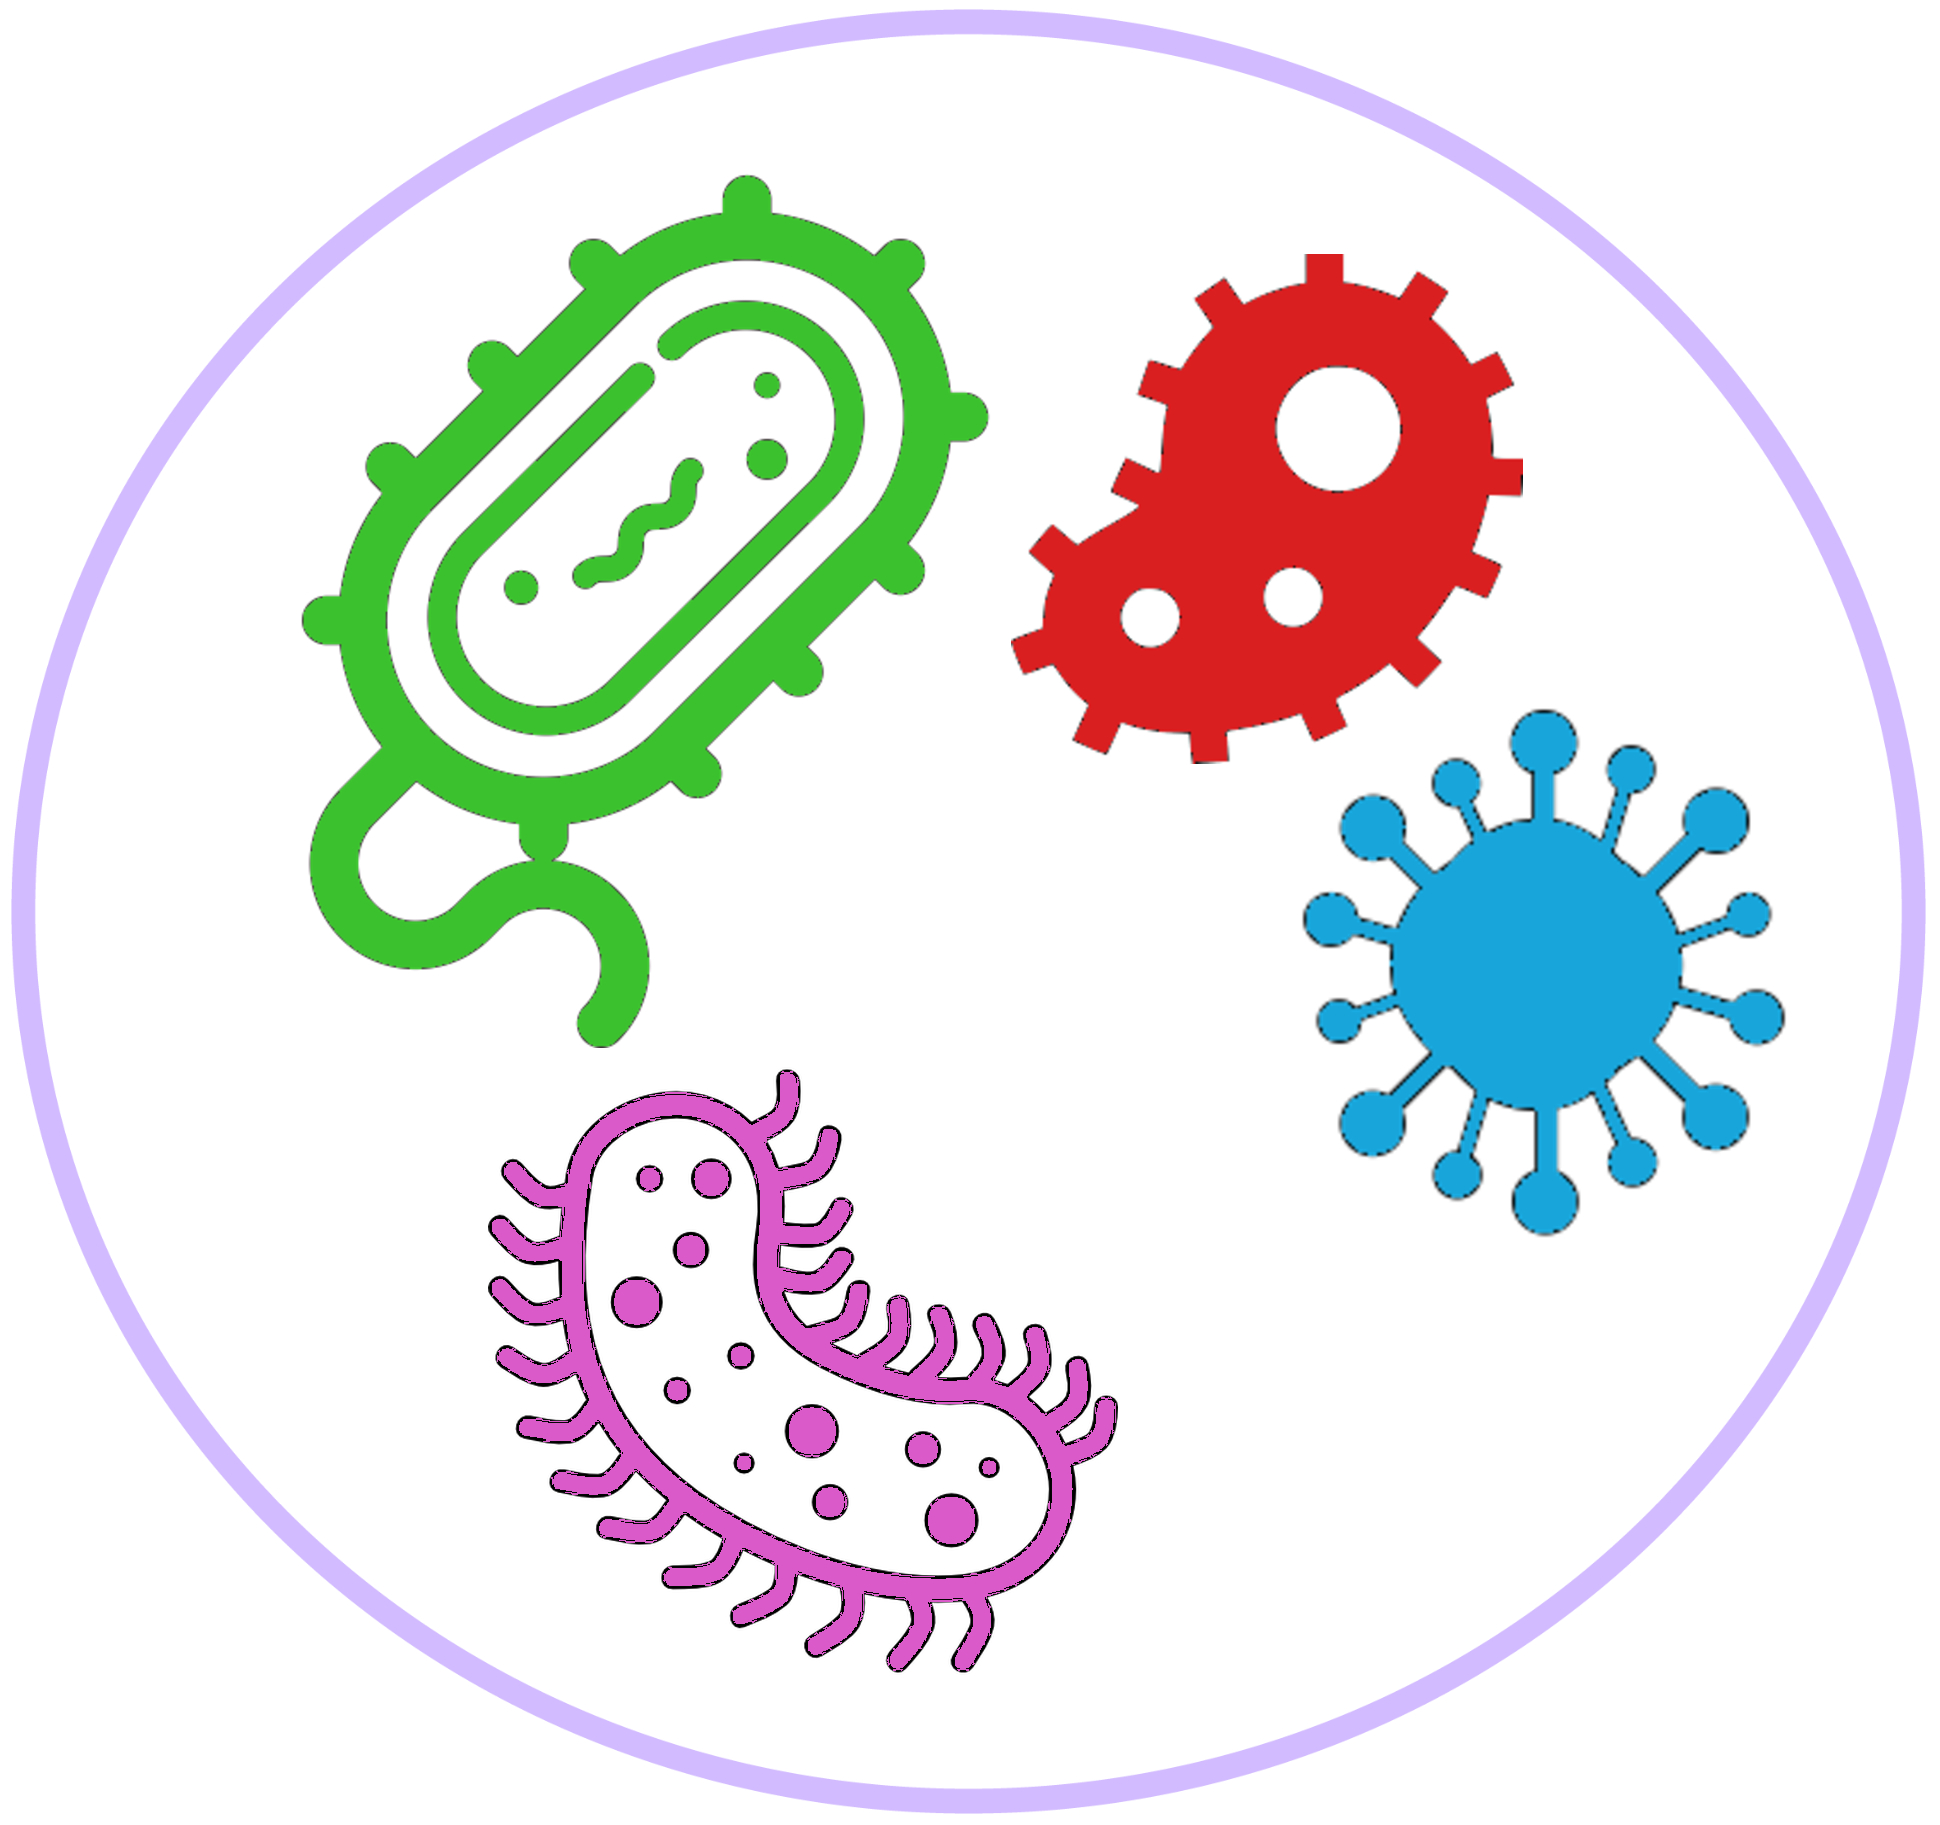 bakterii i infekcii